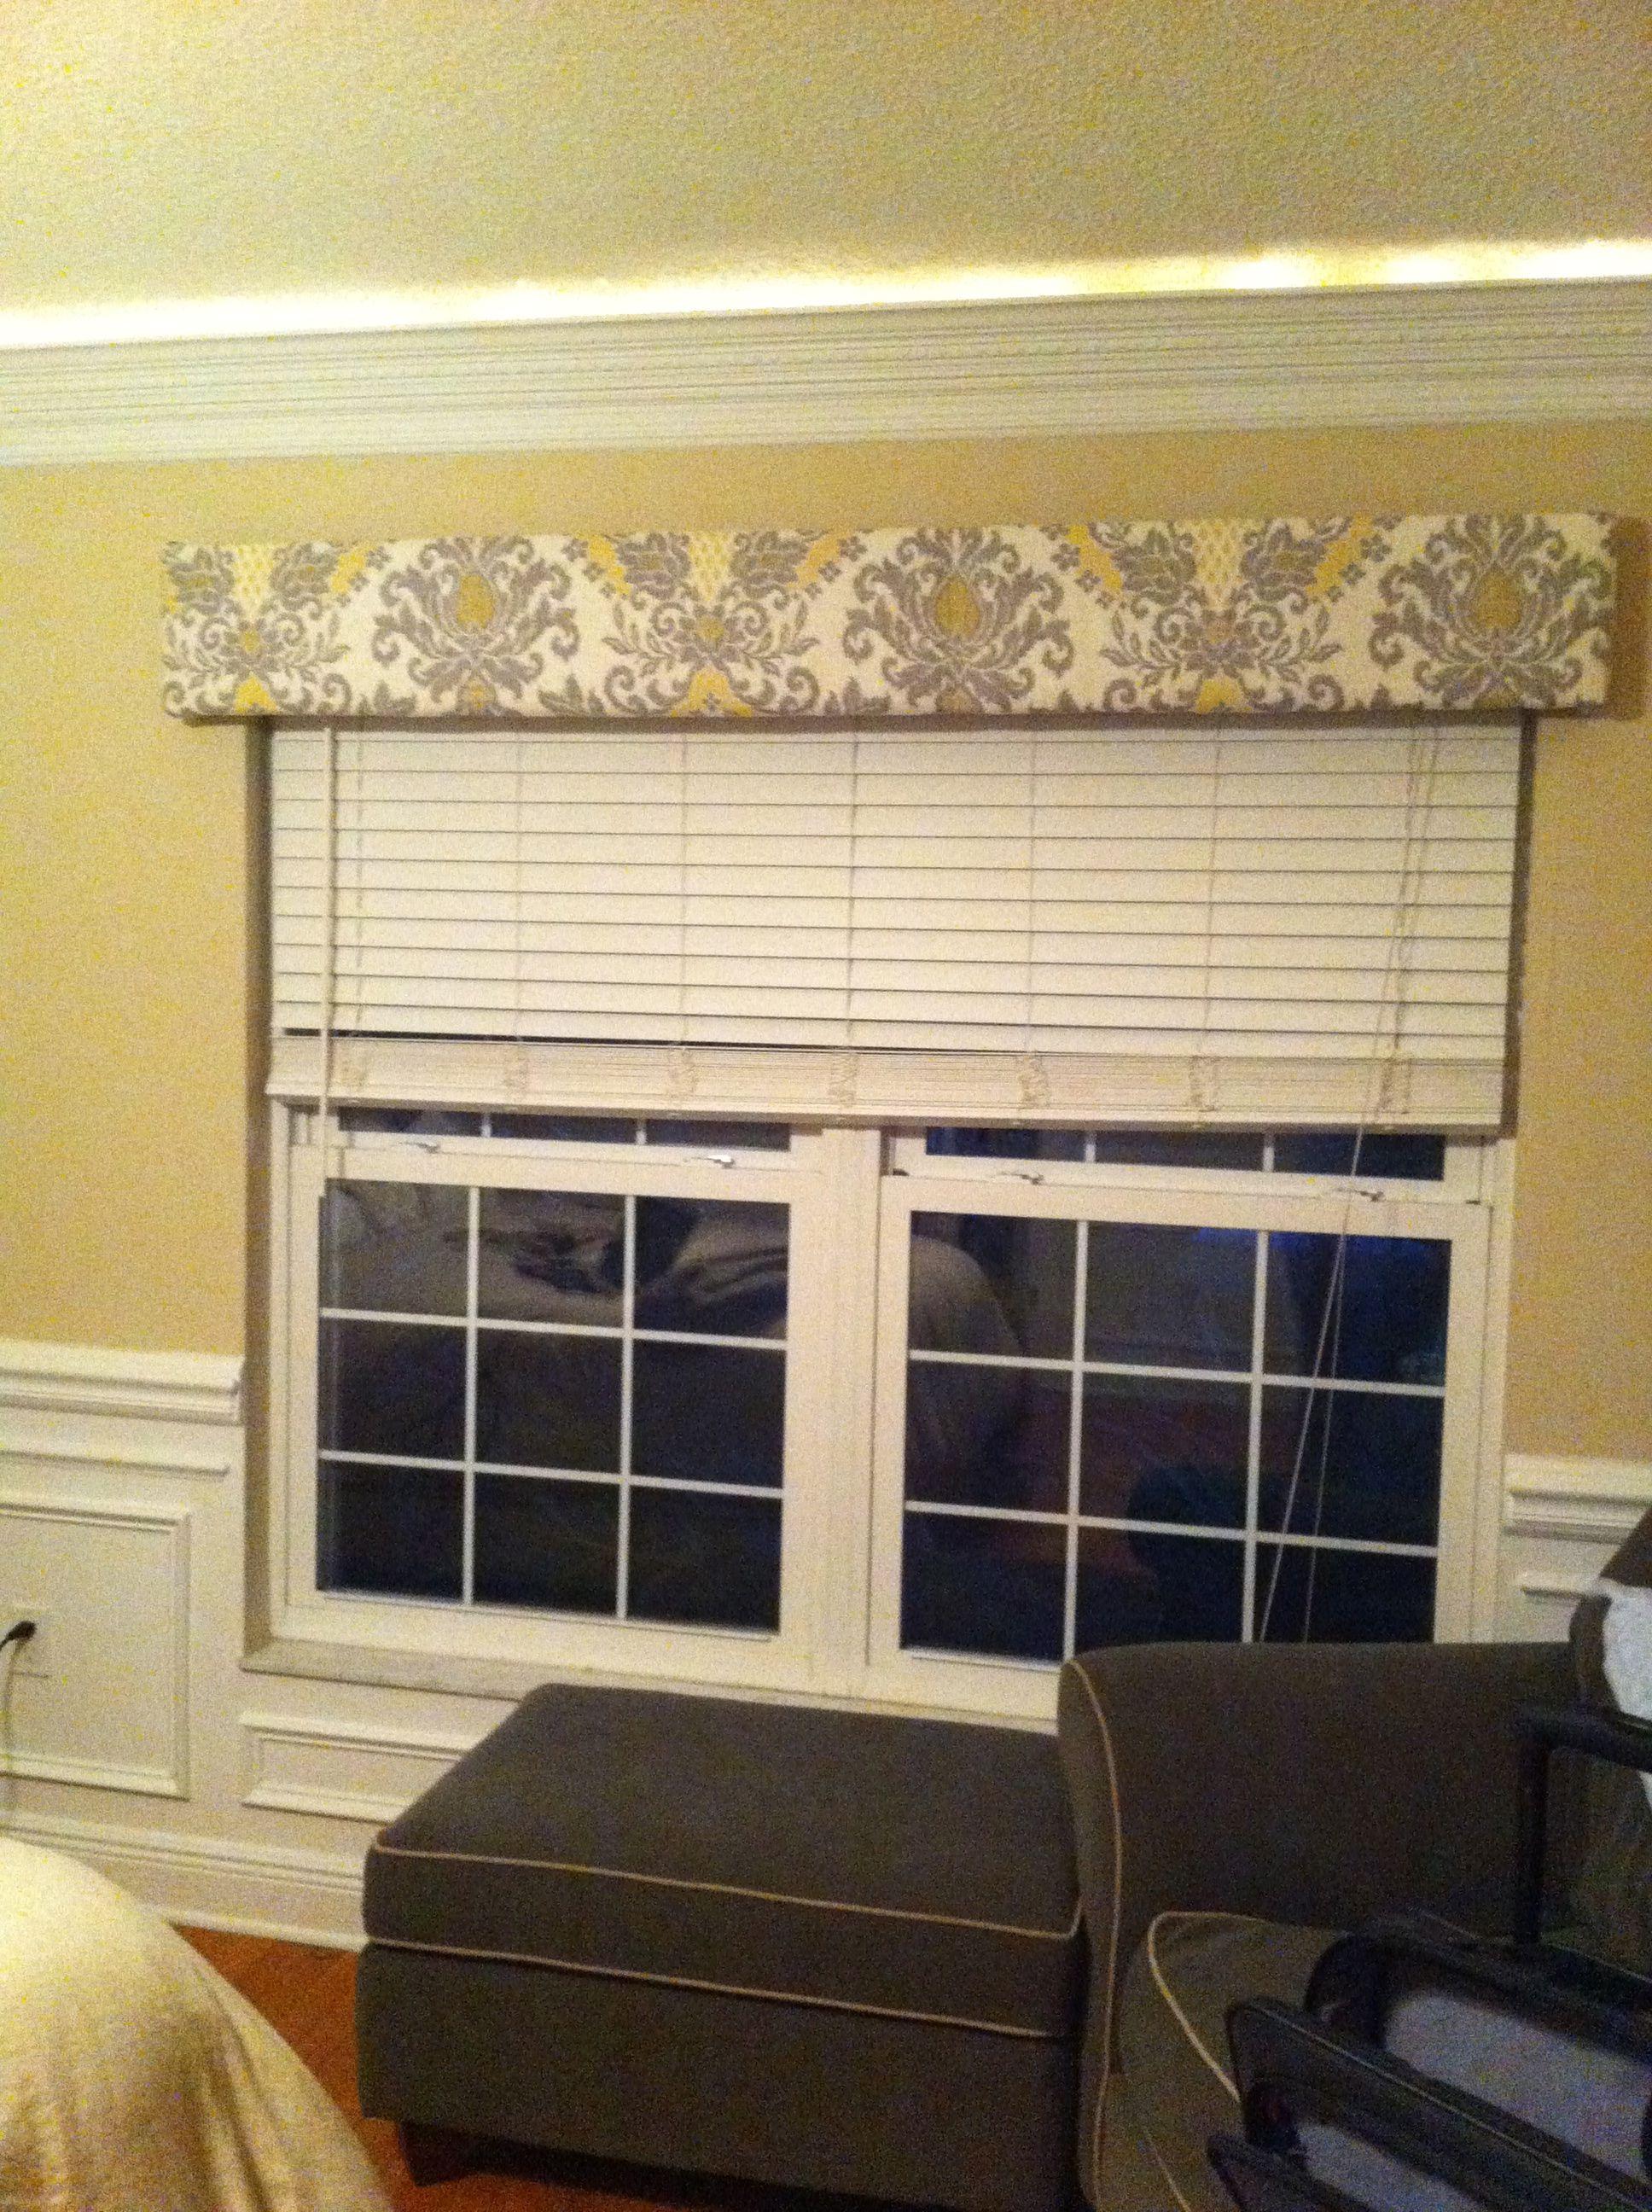 Diy window cornice christine todd for the sliding glass